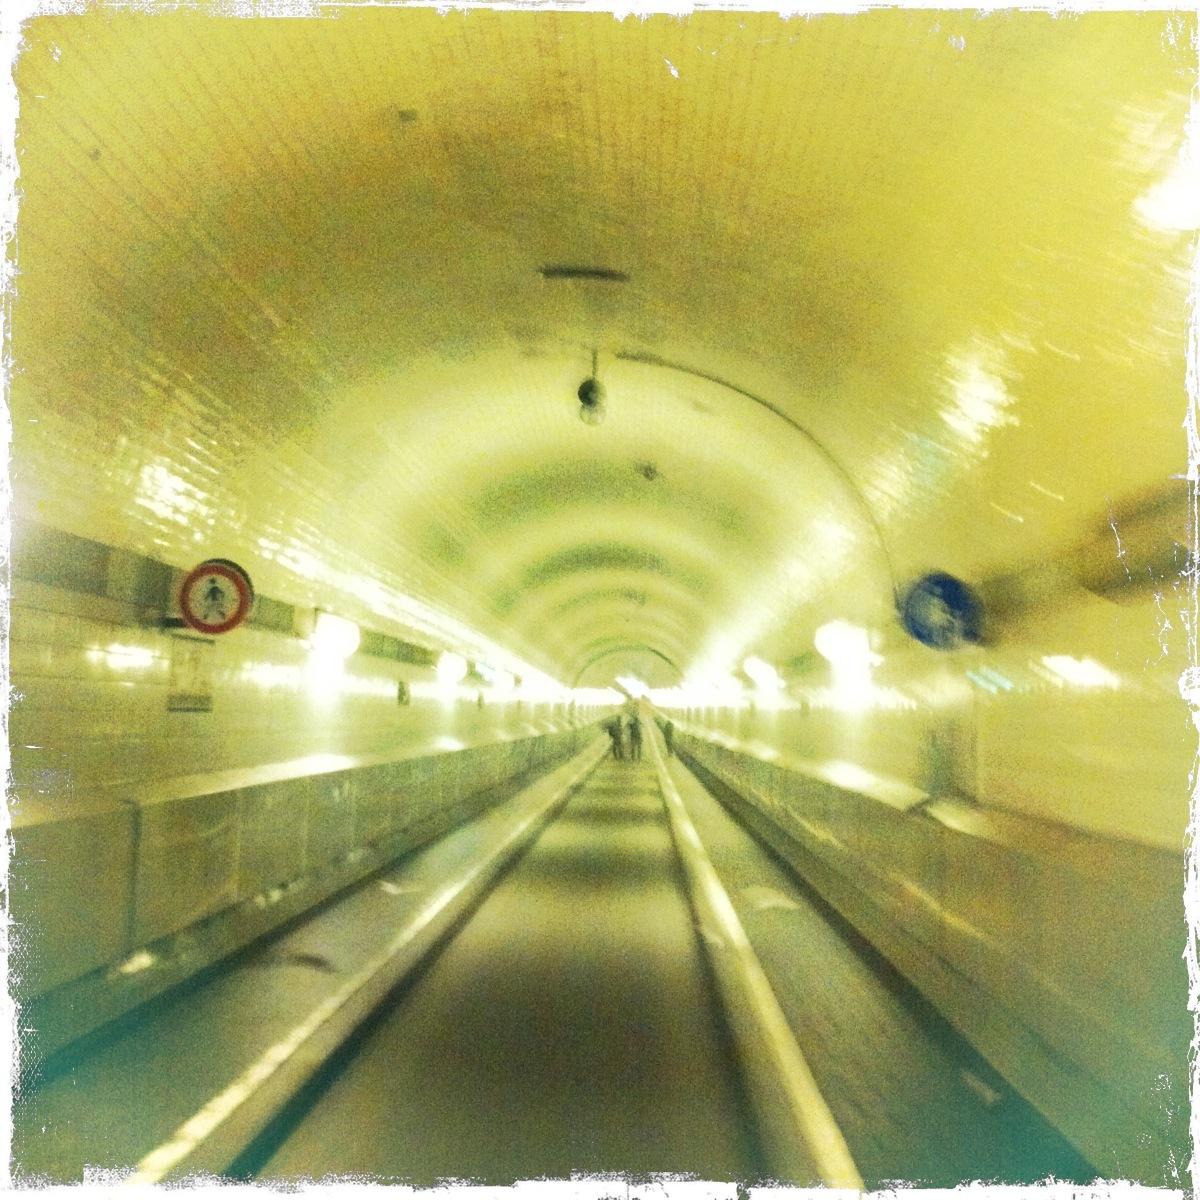 Elbjazz_Tunnel_pushreset